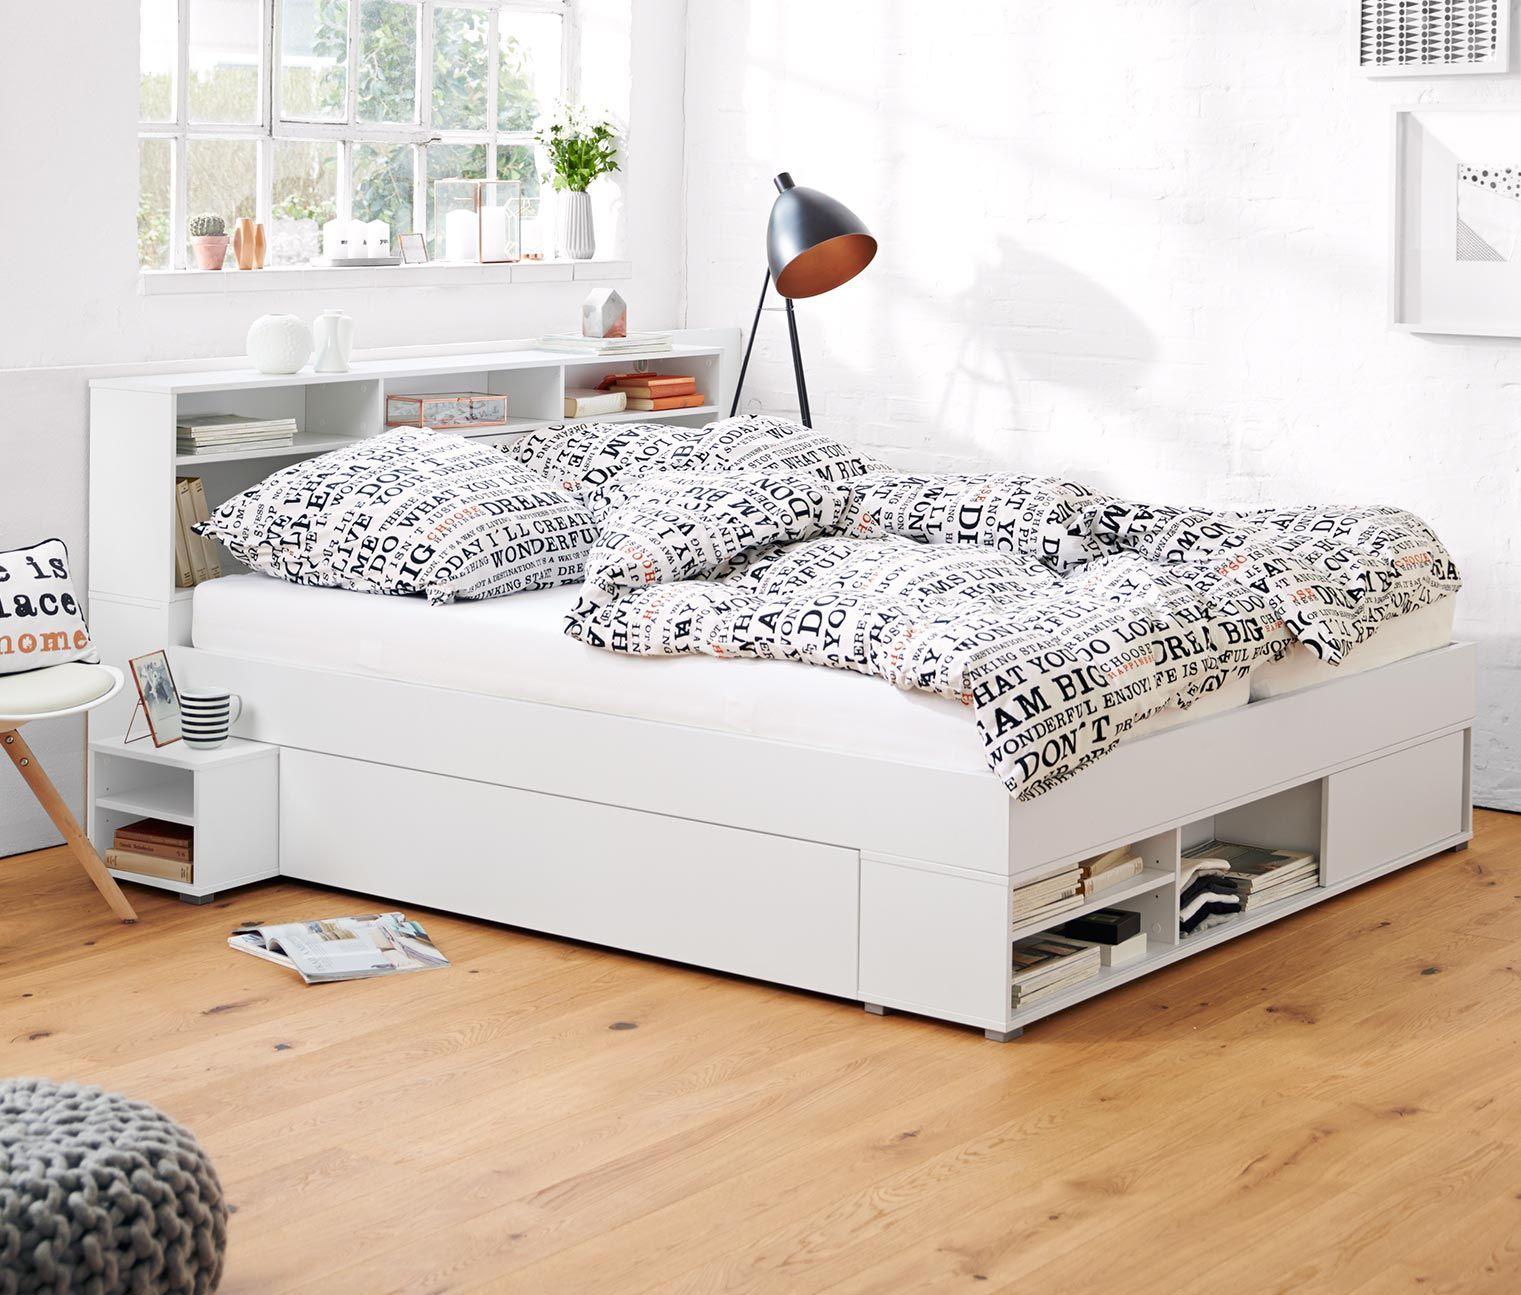 Bett Online Kaufen. Beautiful Alle Betten Ansehen With Bett Online ...